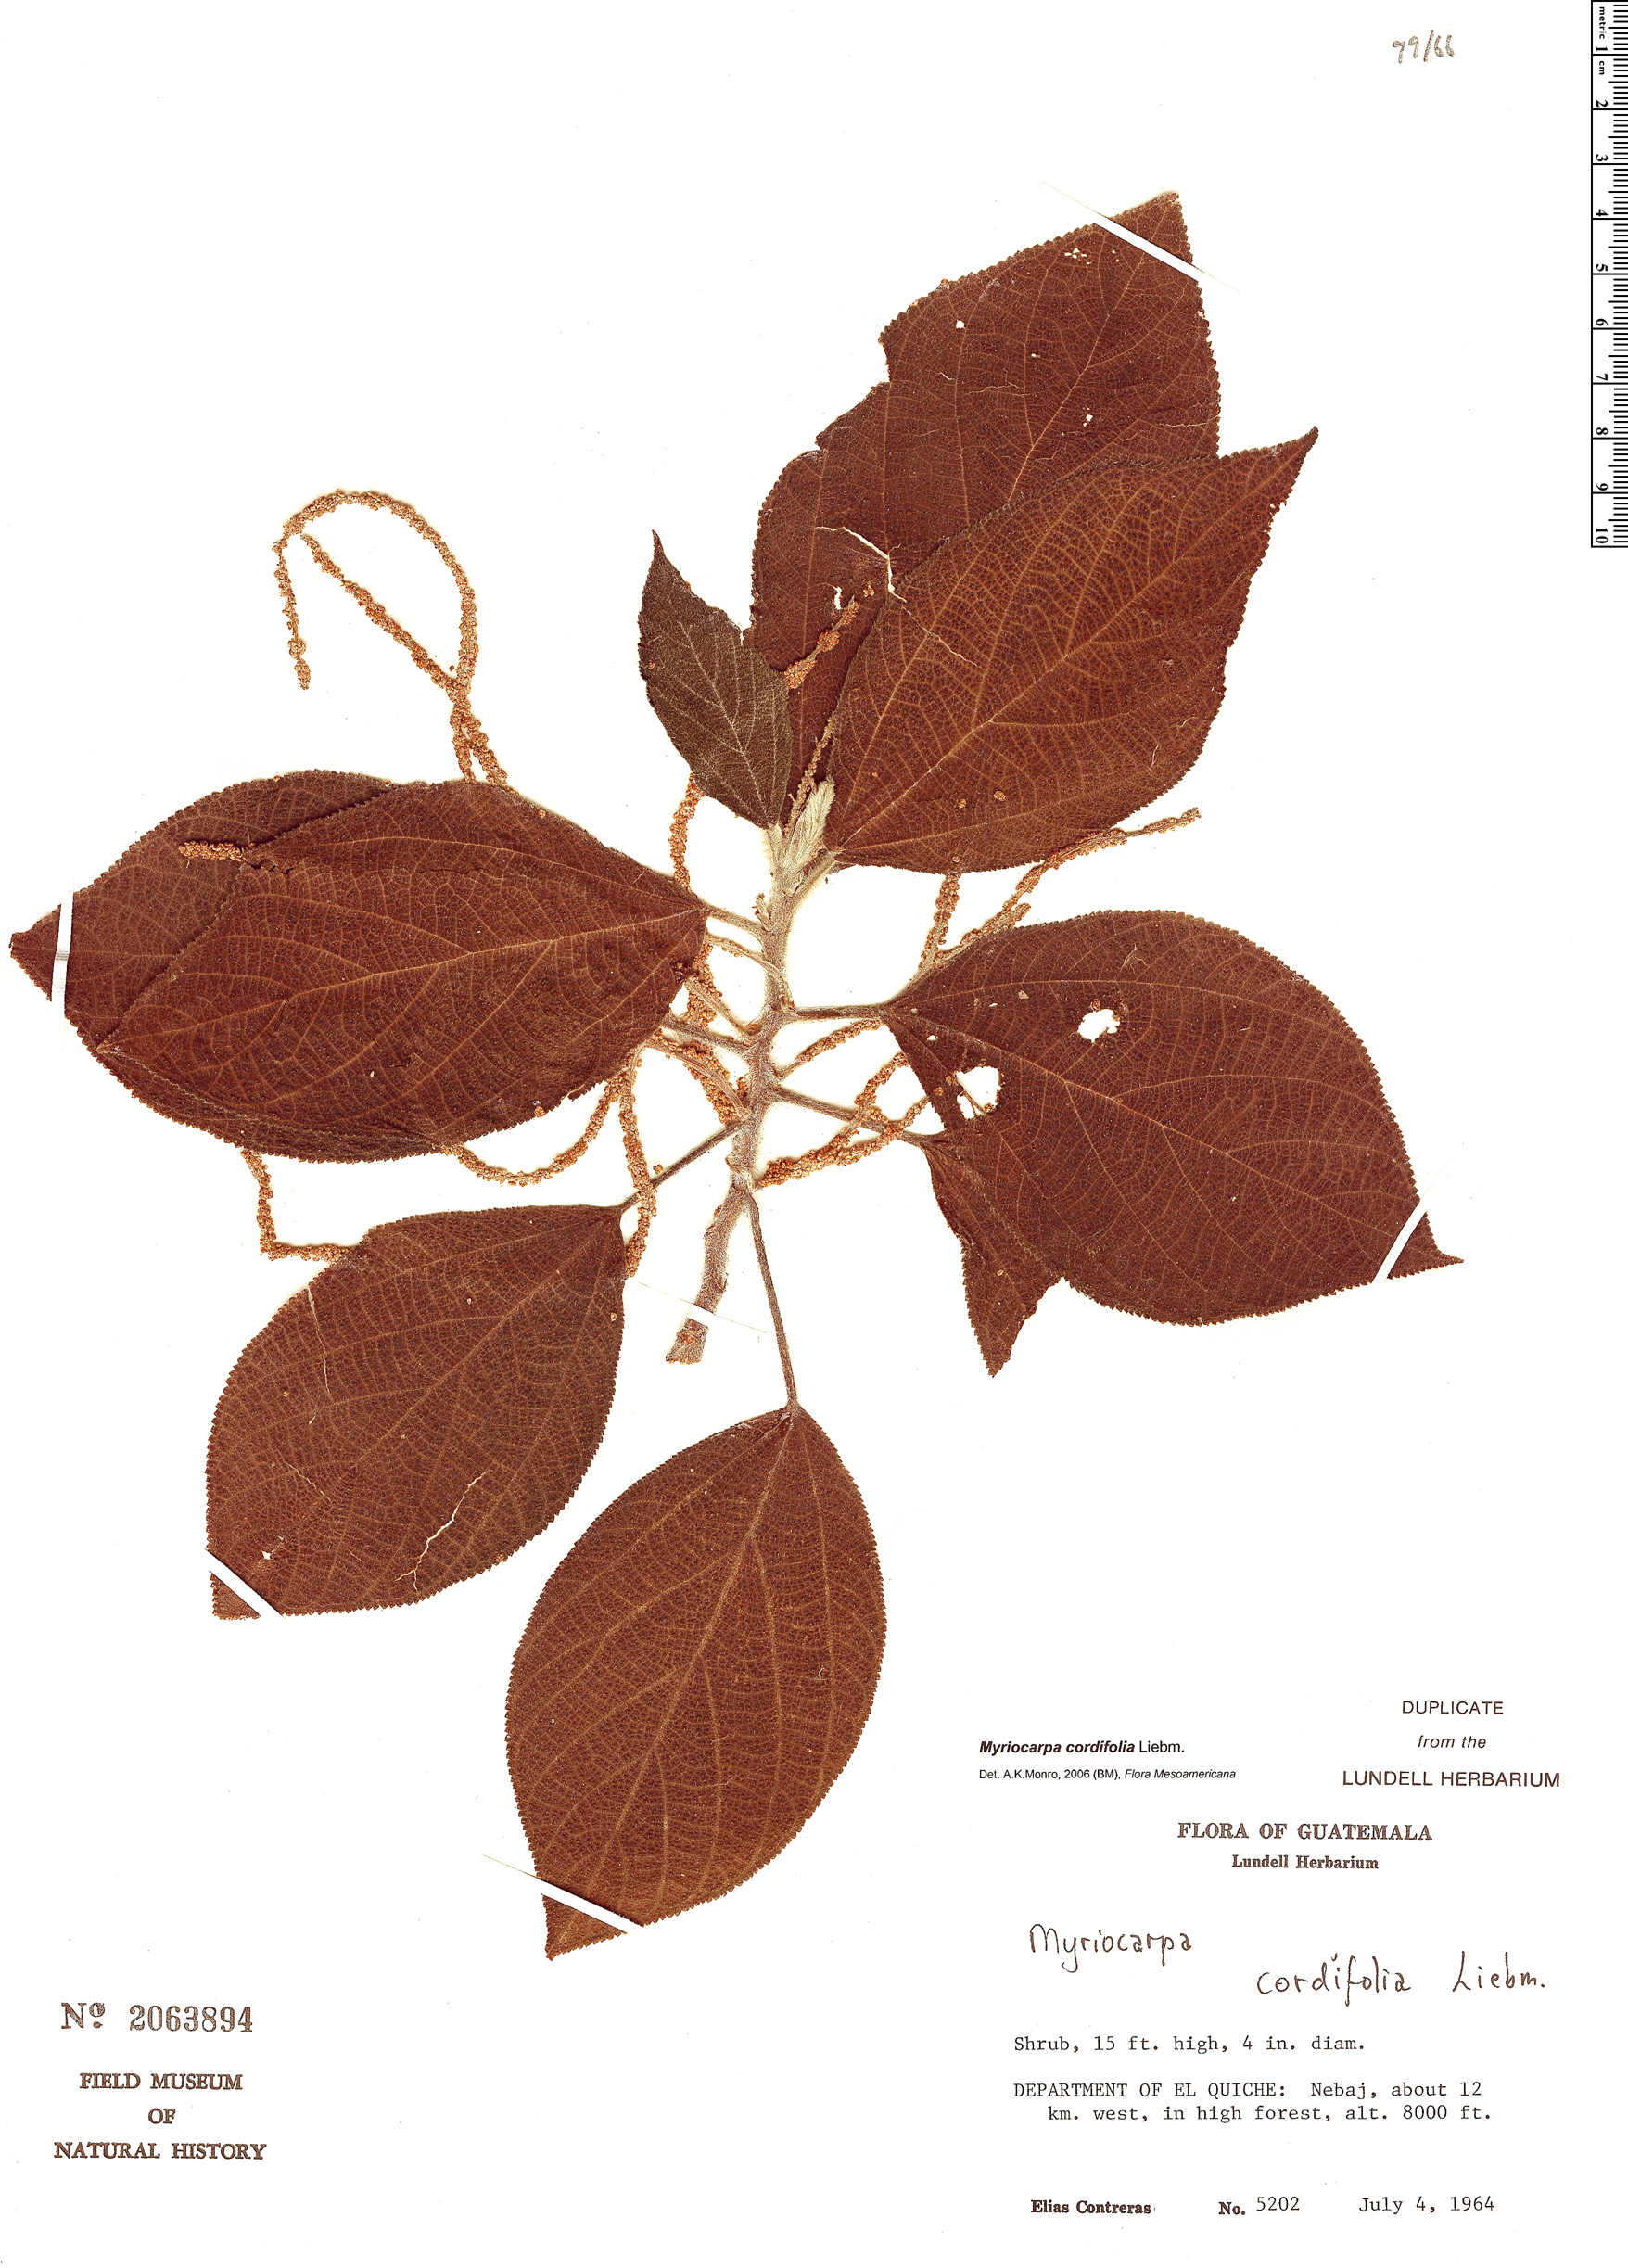 Specimen: Myriocarpa cordifolia